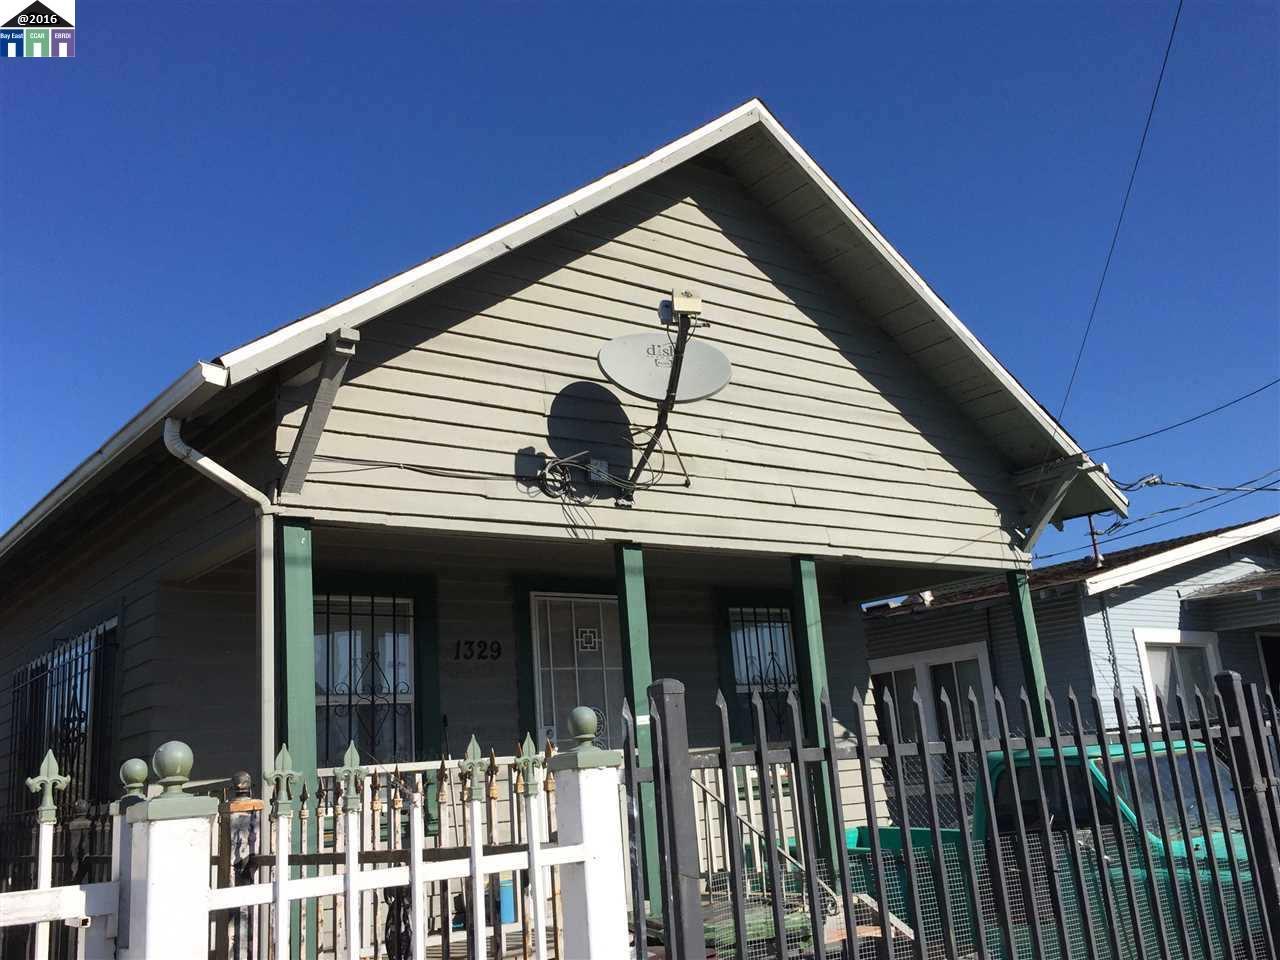 1329 94th Ave, Oakland, CA